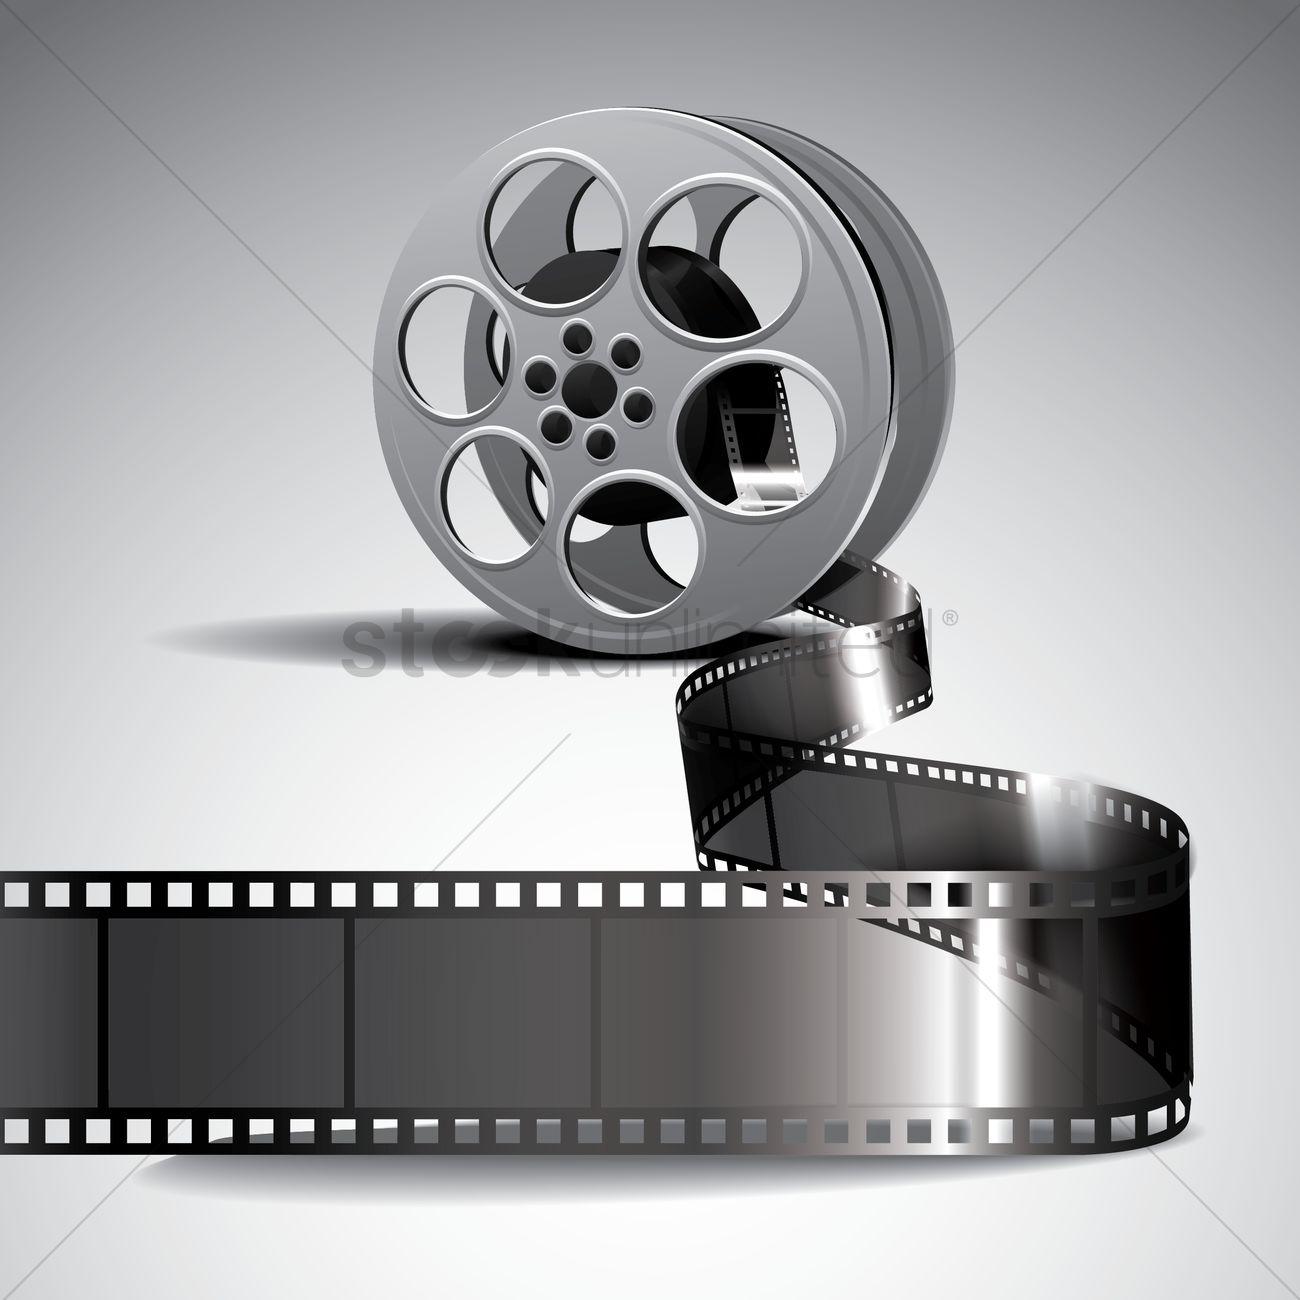 1300x1300 Film Reel Vector Image